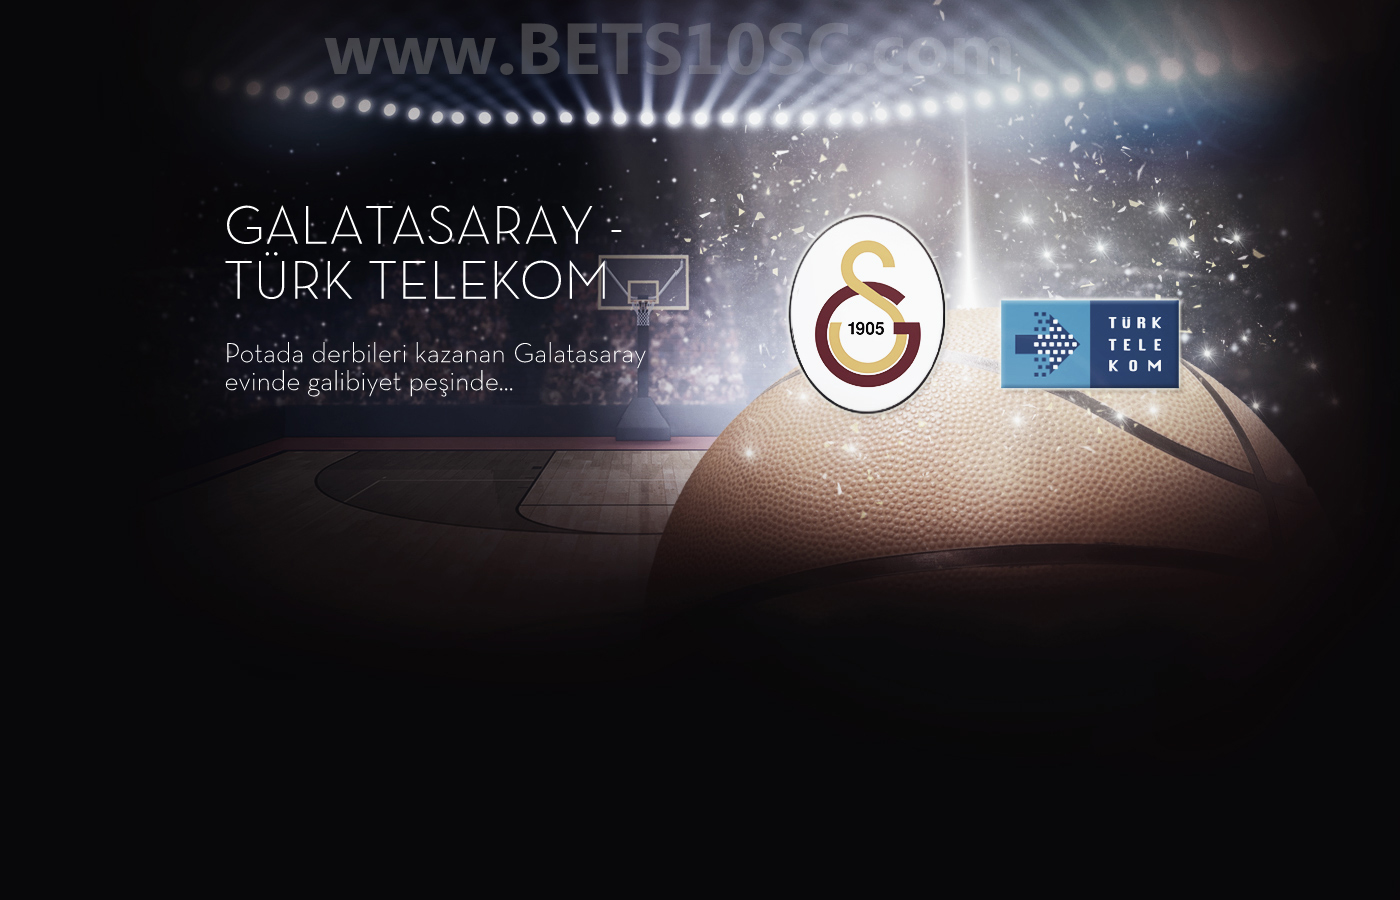 Bets10 Galatasaray Türk Telekom Basketbol Maçı